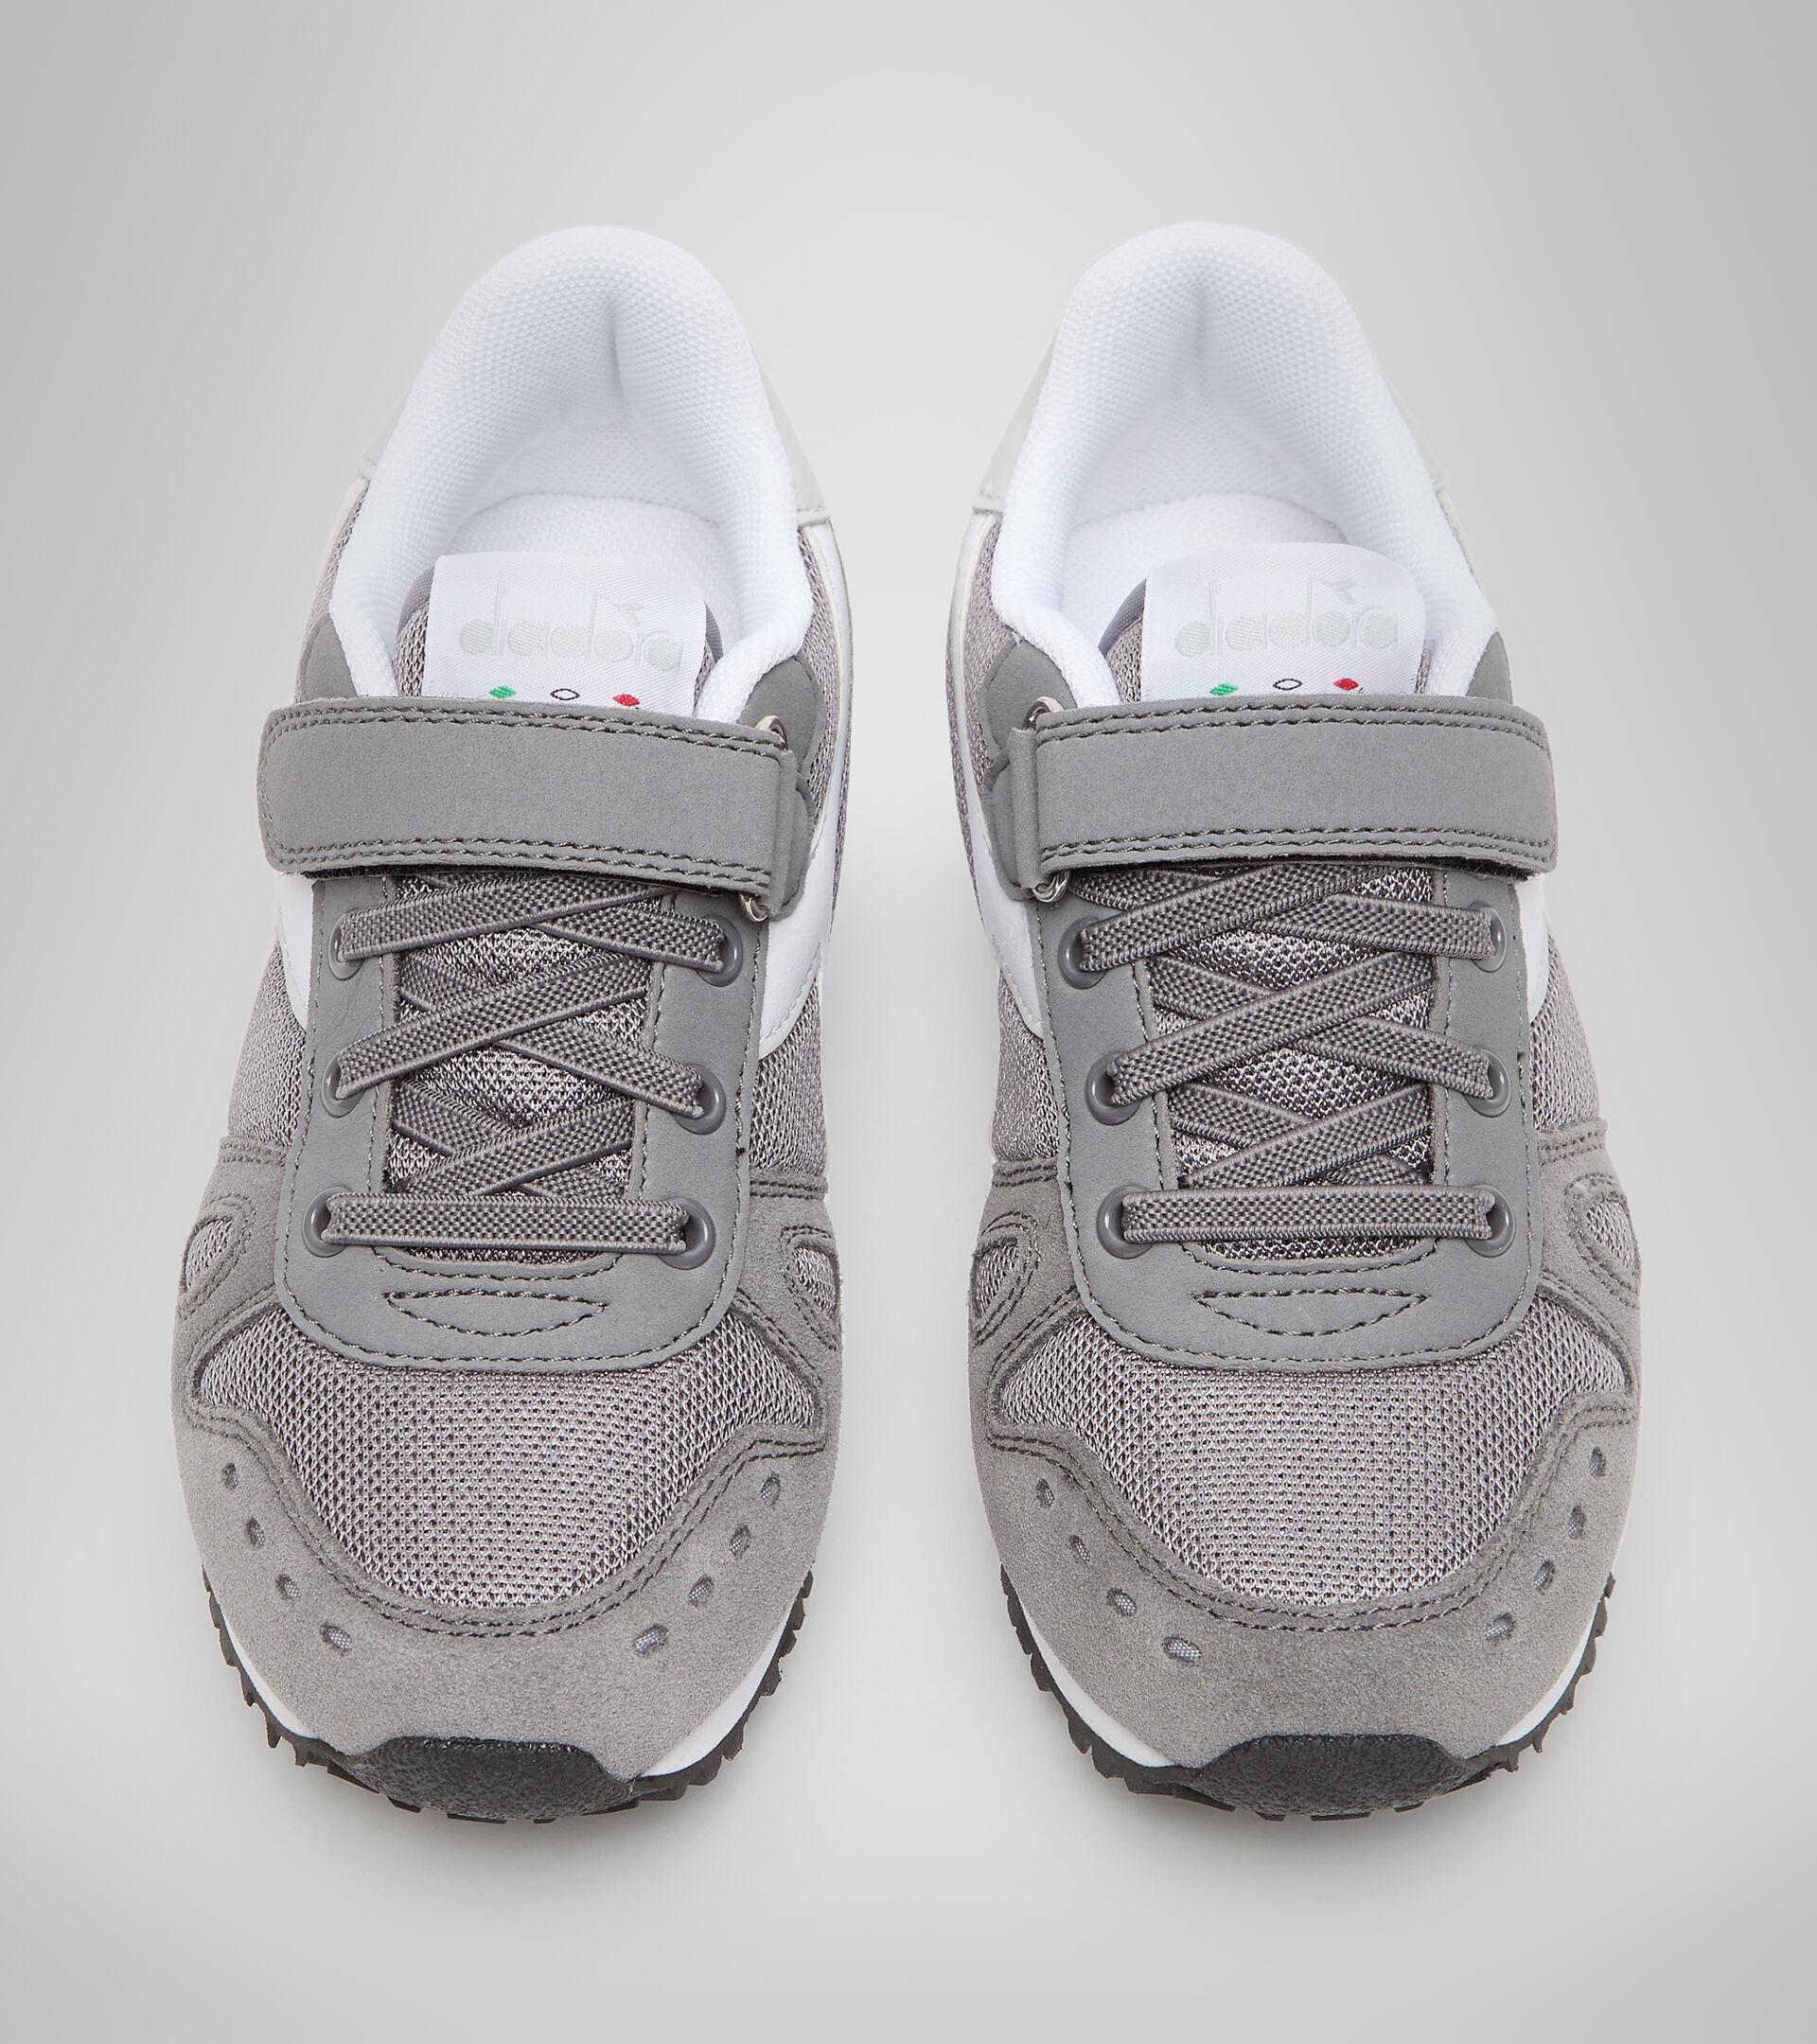 Footwear Sport BAMBINO SIMPLE RUN PS STEEL GRAY Diadora